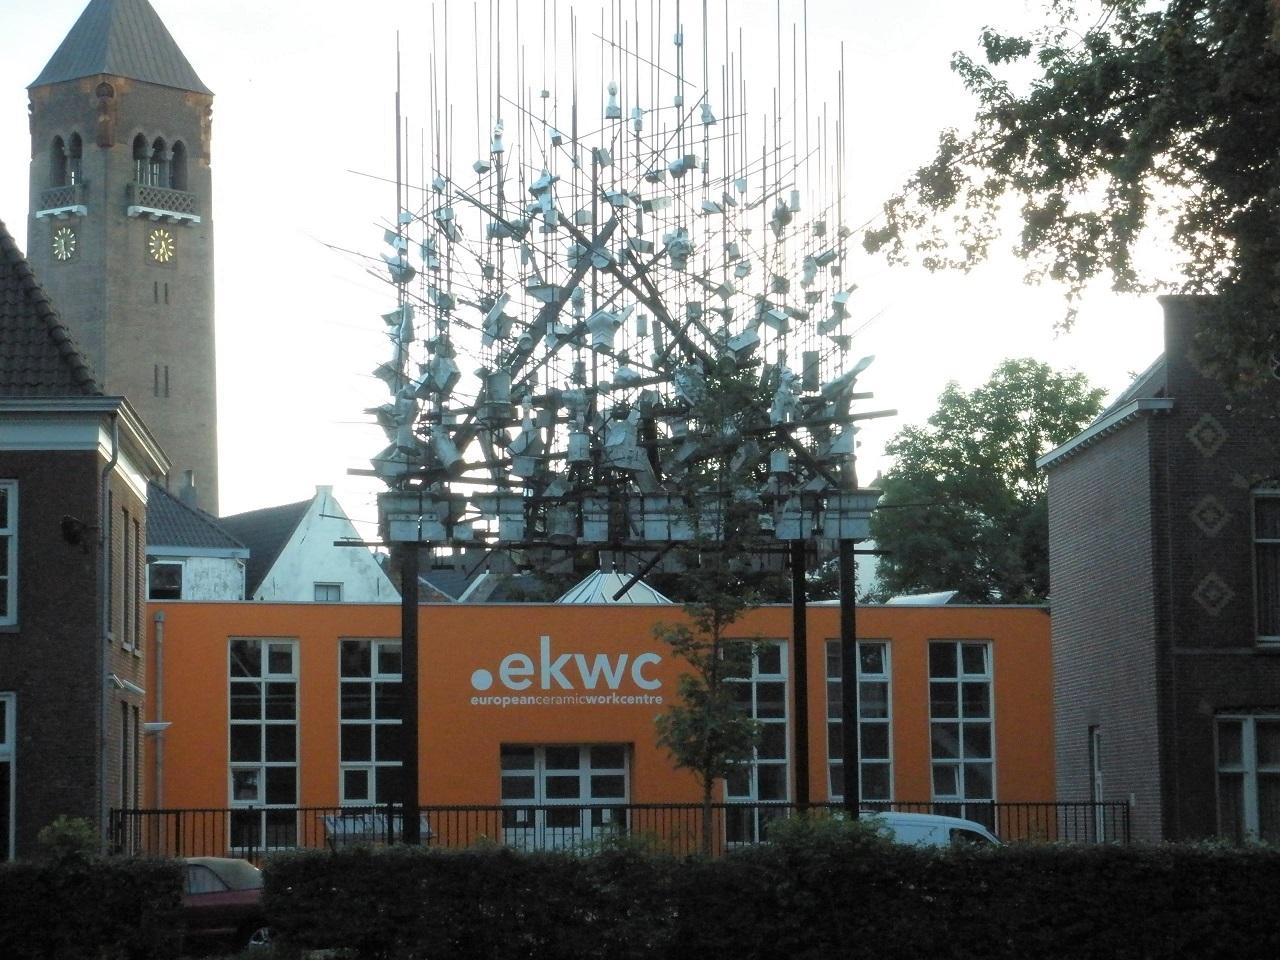 European Ceramic Work Centre, s'Hertogenbosch, The Netherlands